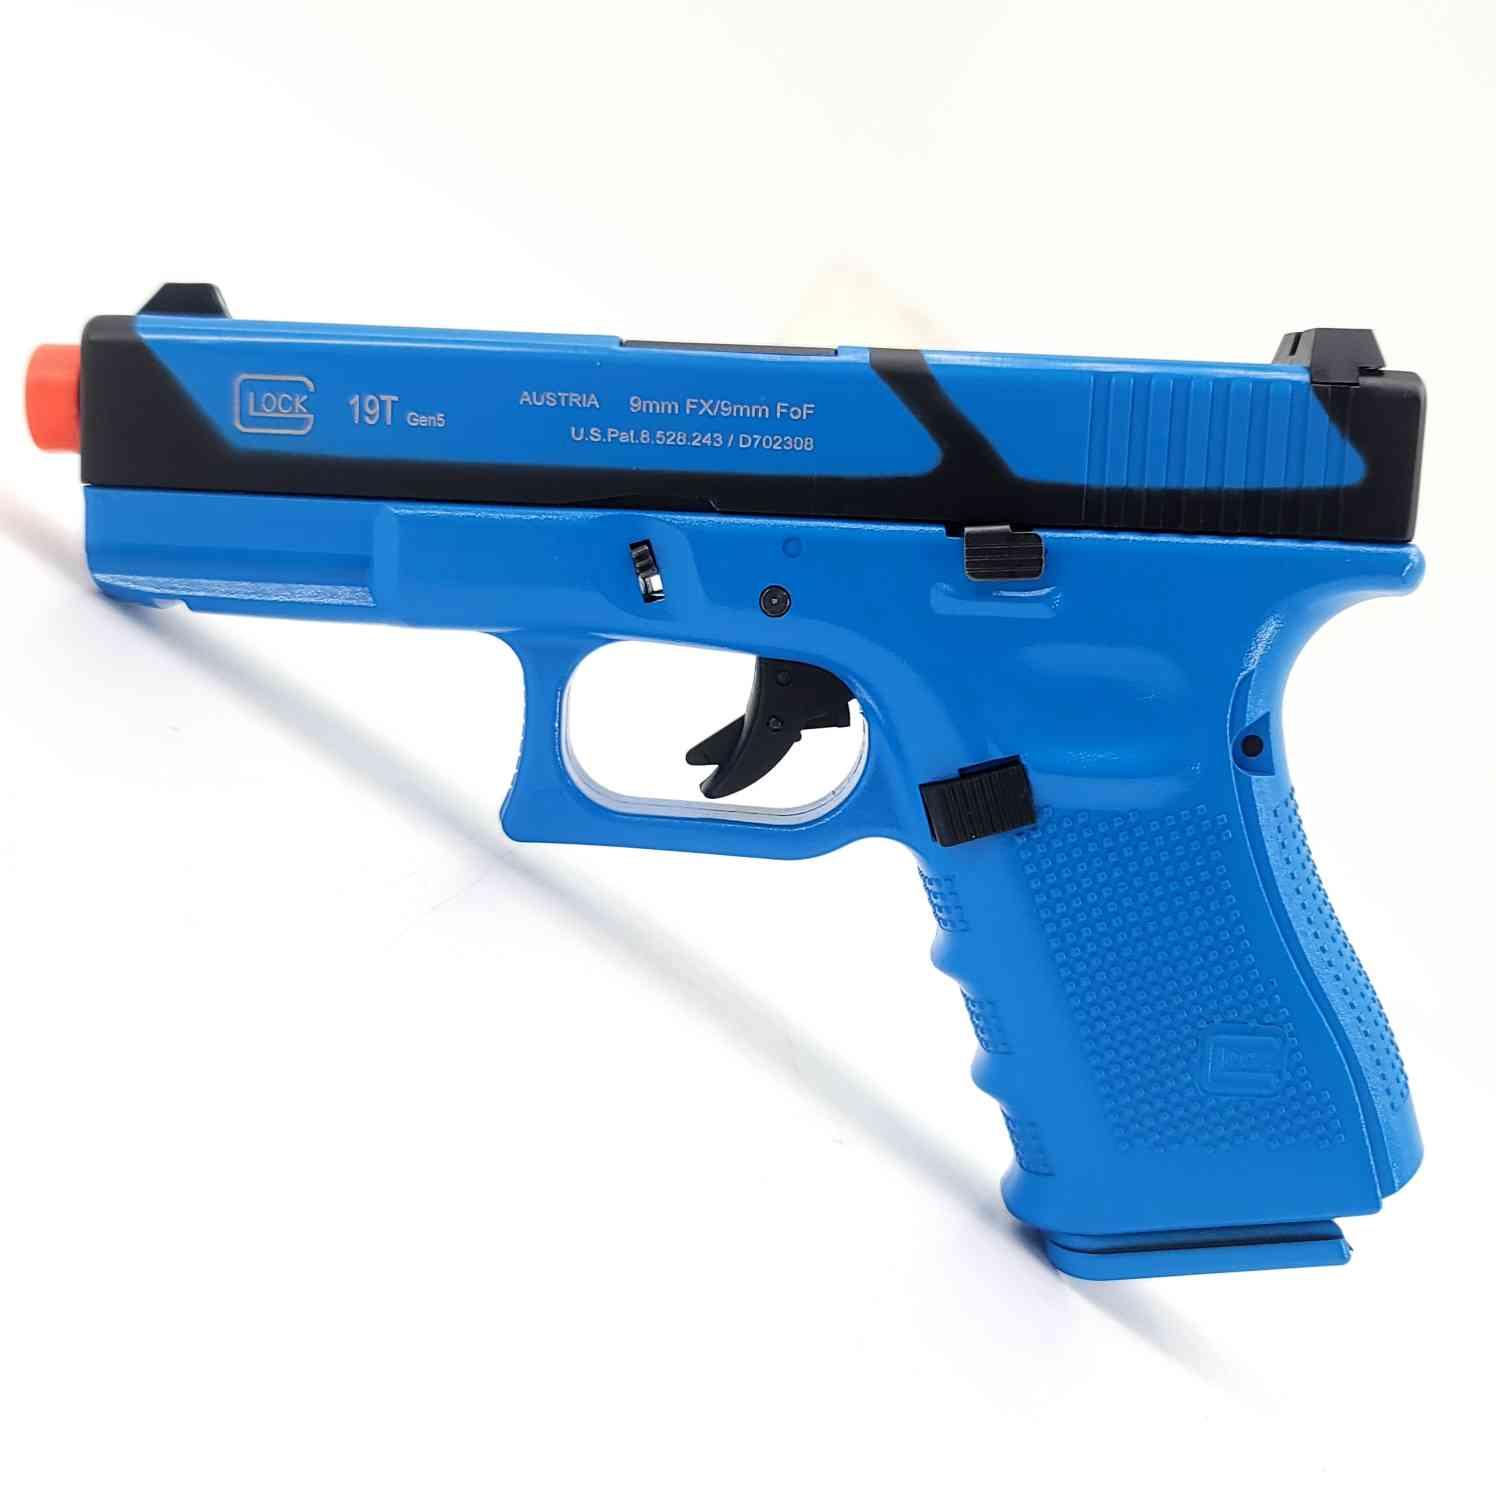 DOUBLE BELL Glock G19T Gen4 SpeedQB Gas Powered Gel Blaster BLUE [772-1]